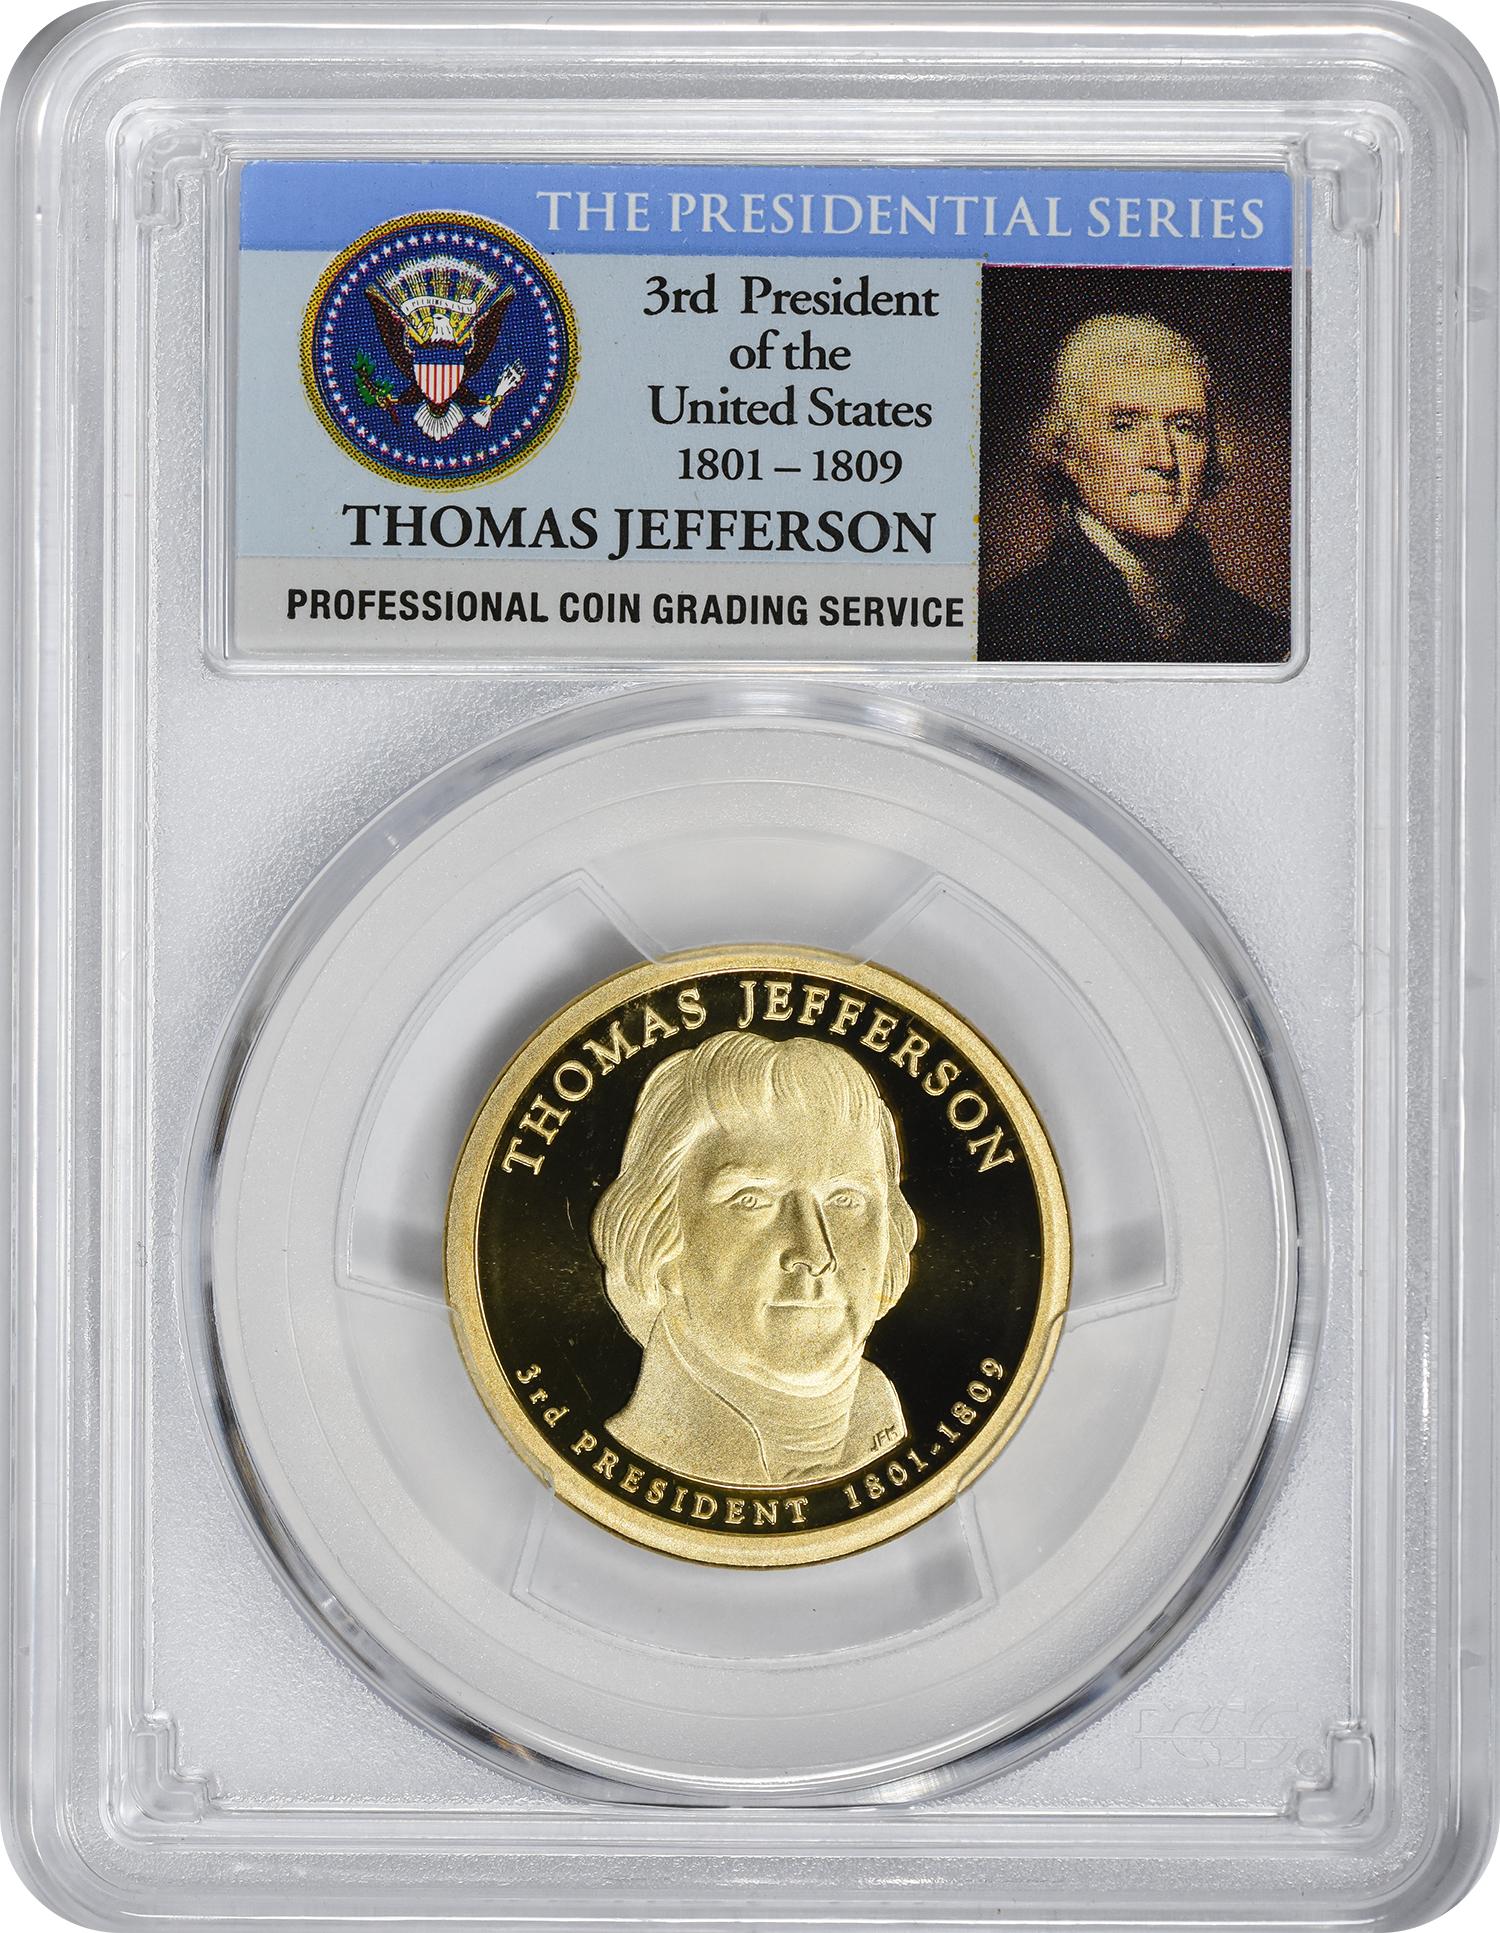 2007-S Thomas Jefferson Presidential Dollar, PR70DCAM, PCGS